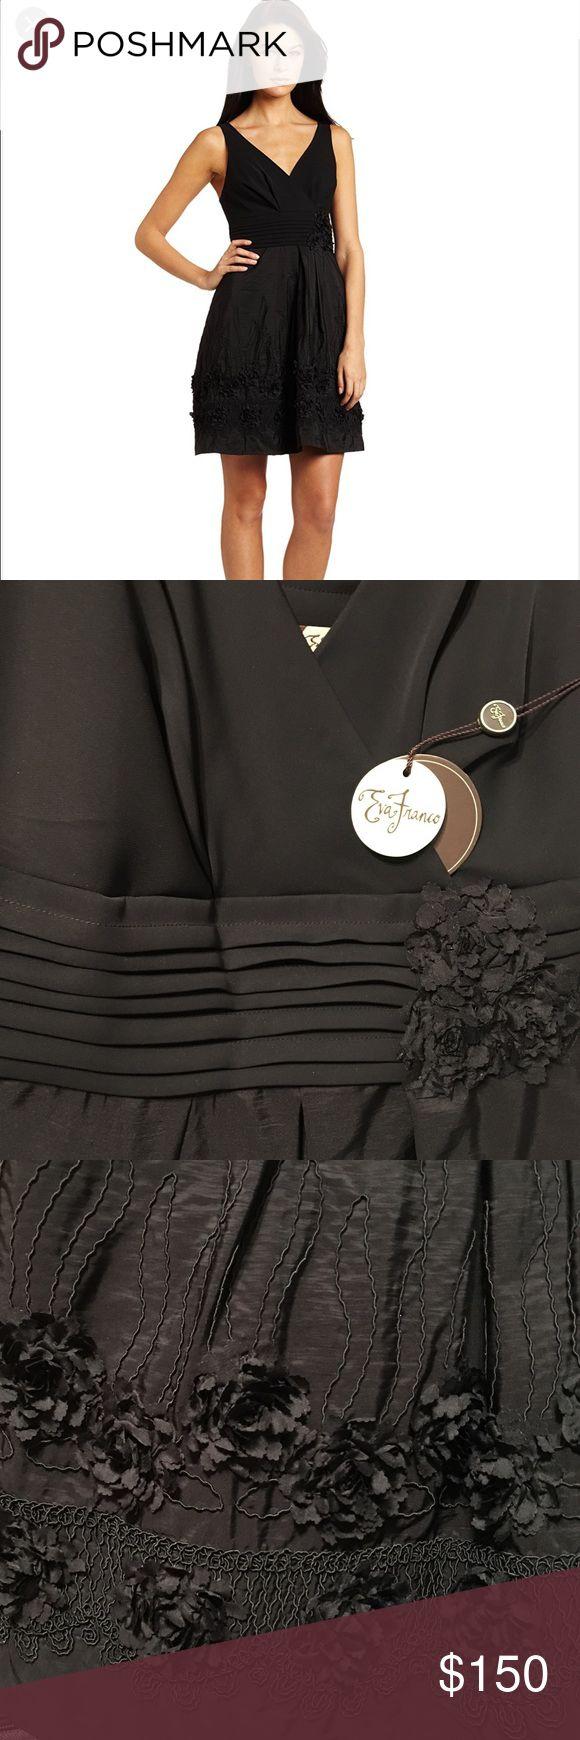 Eva Franco Marilyn dress- size 6 NWT beautiful Eva Franco embroidered dress. Black size 6. Stunning details. Eva Franco Dresses Mini